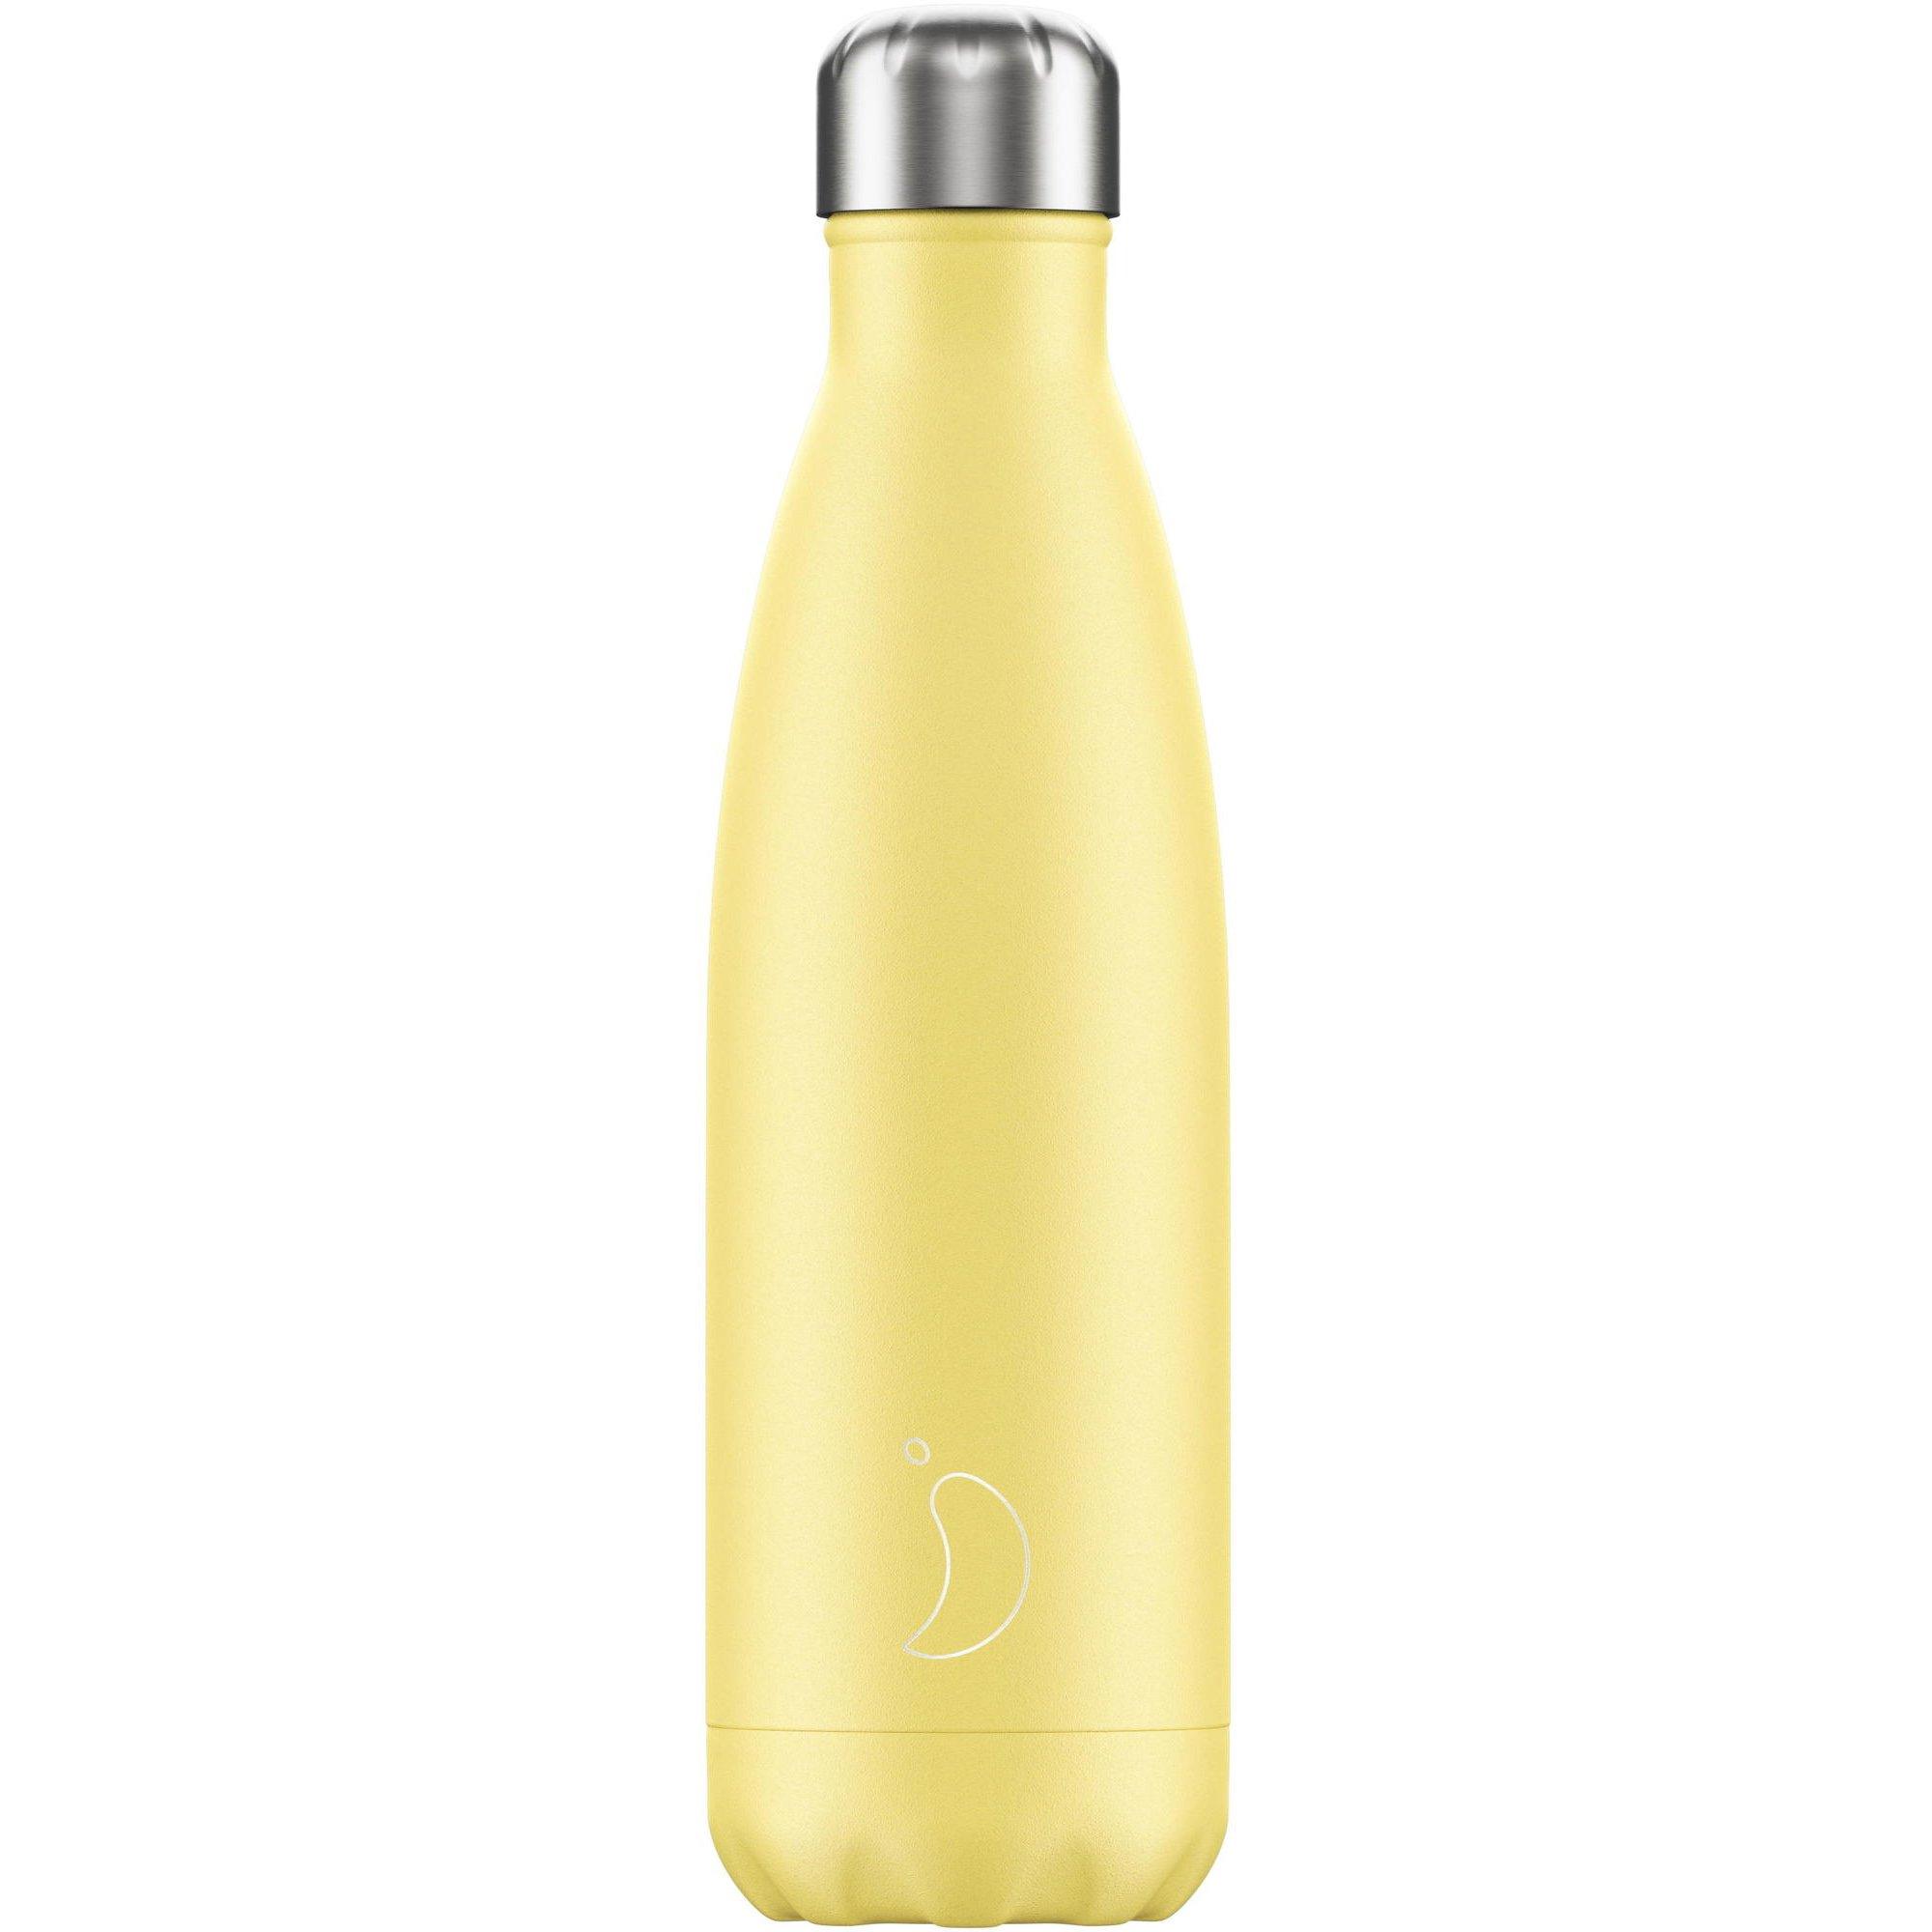 Chilly's Bottle Ανοξείδωτο Θερμός 500ml – Κίτρινο Παστέλ